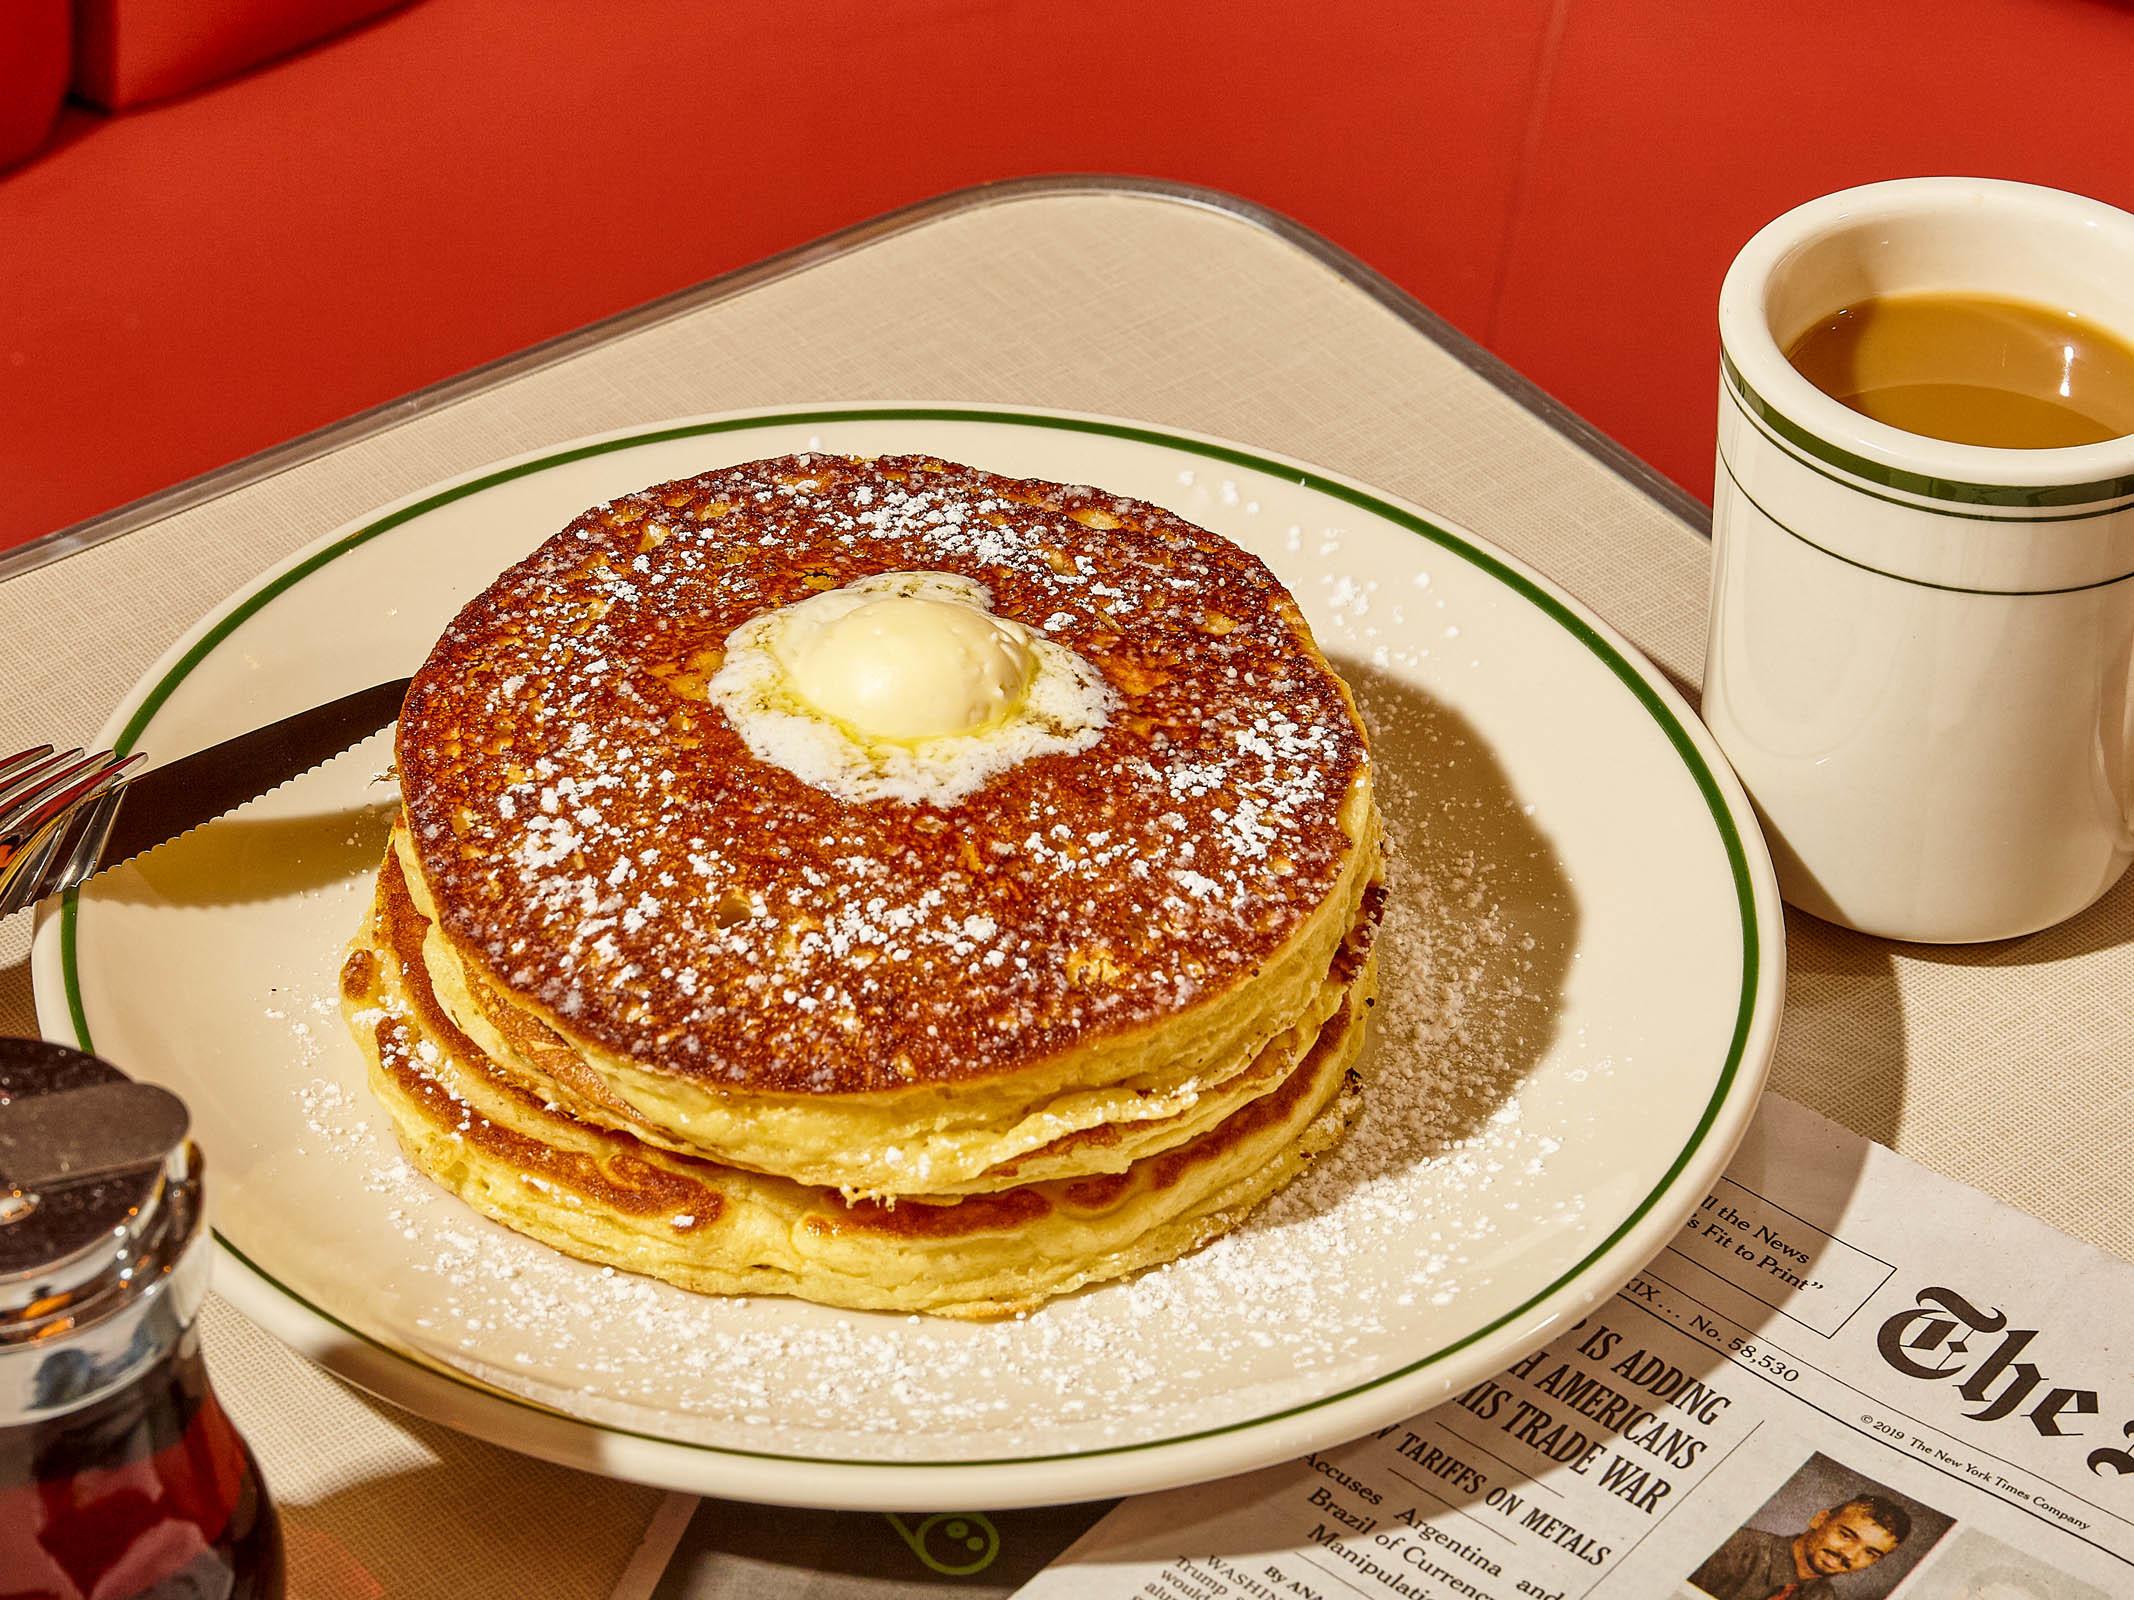 Soho Diner pancakes